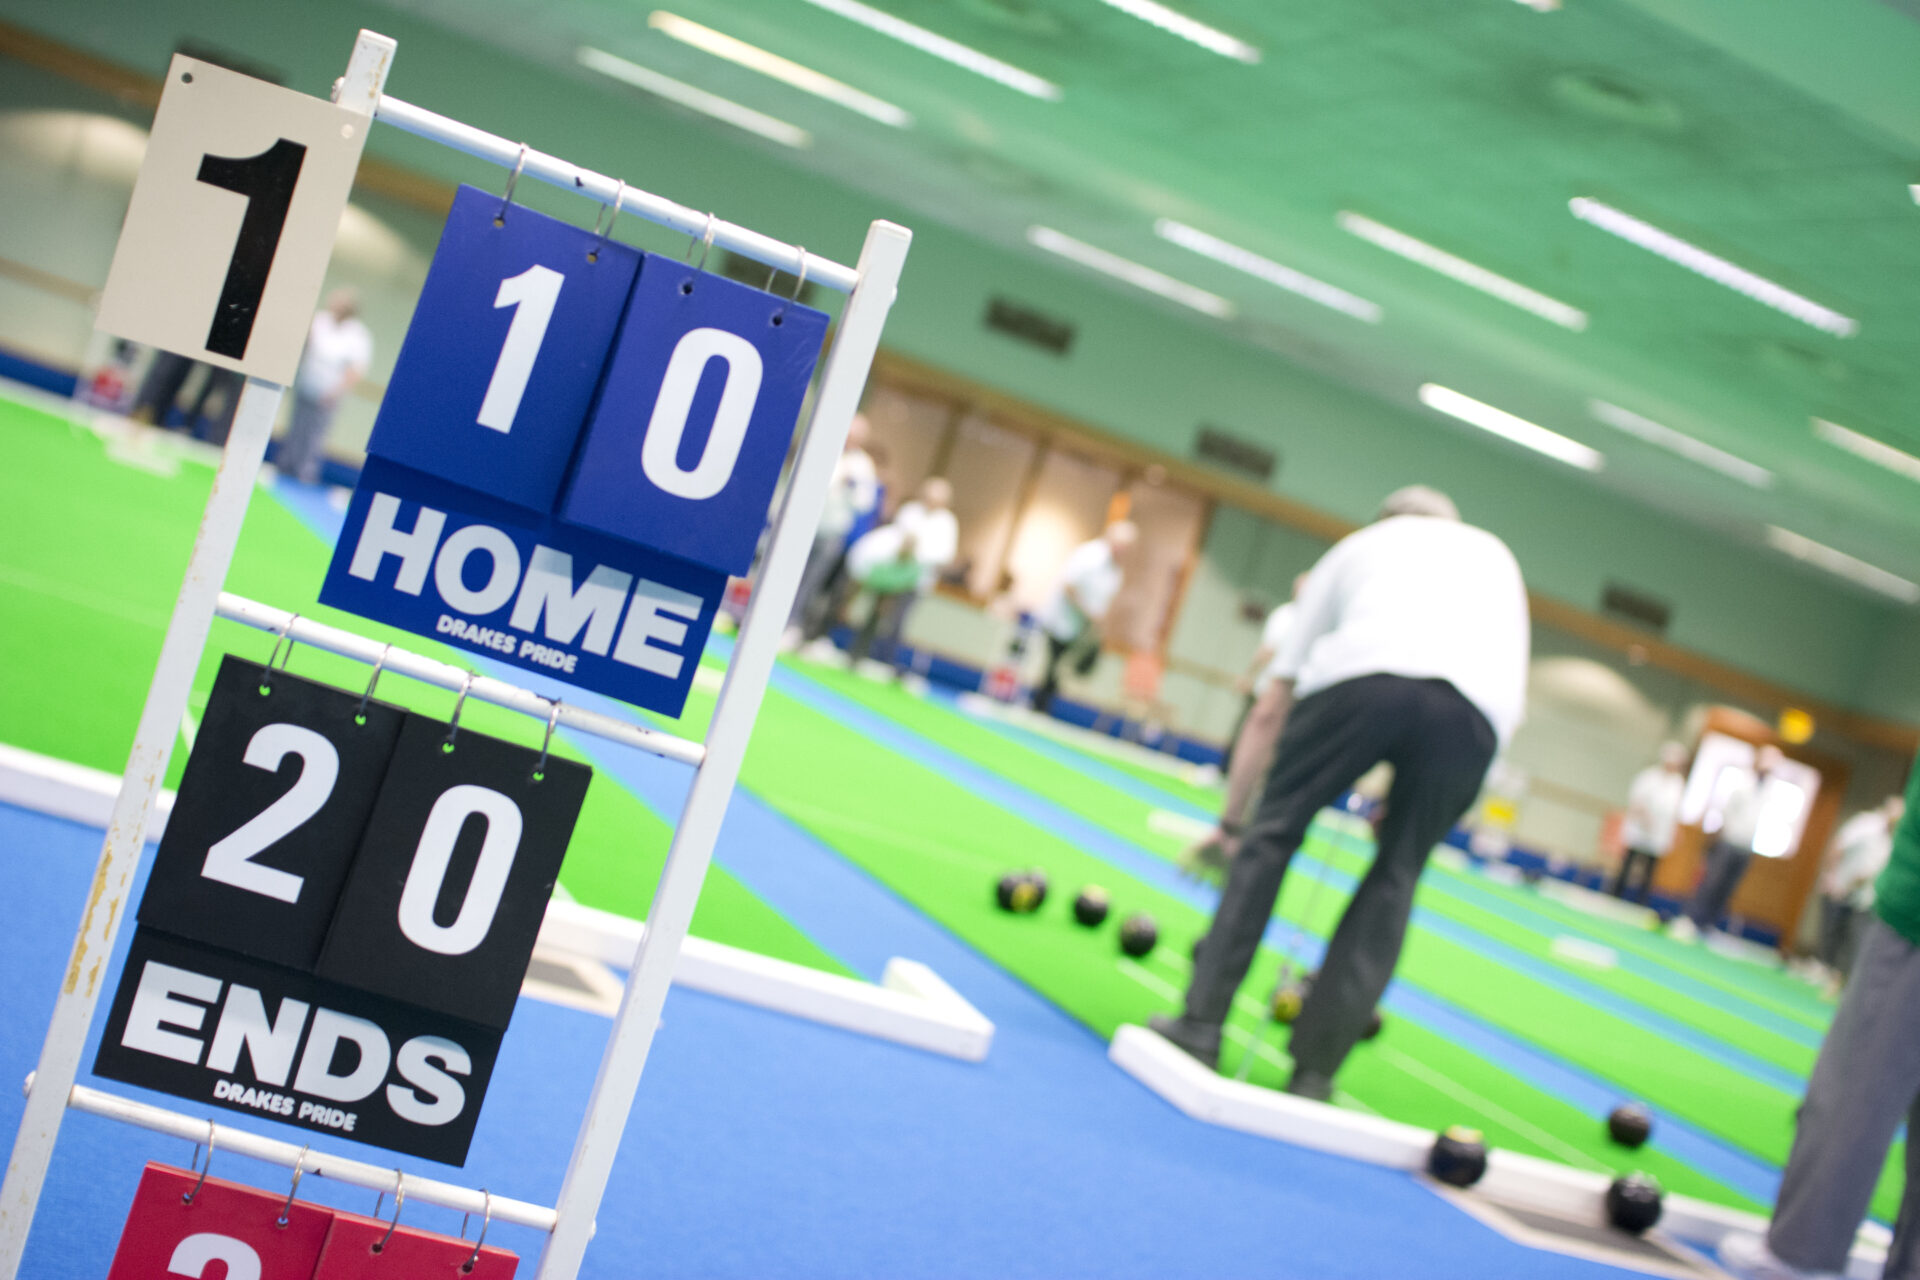 Short mat bowling Torquay